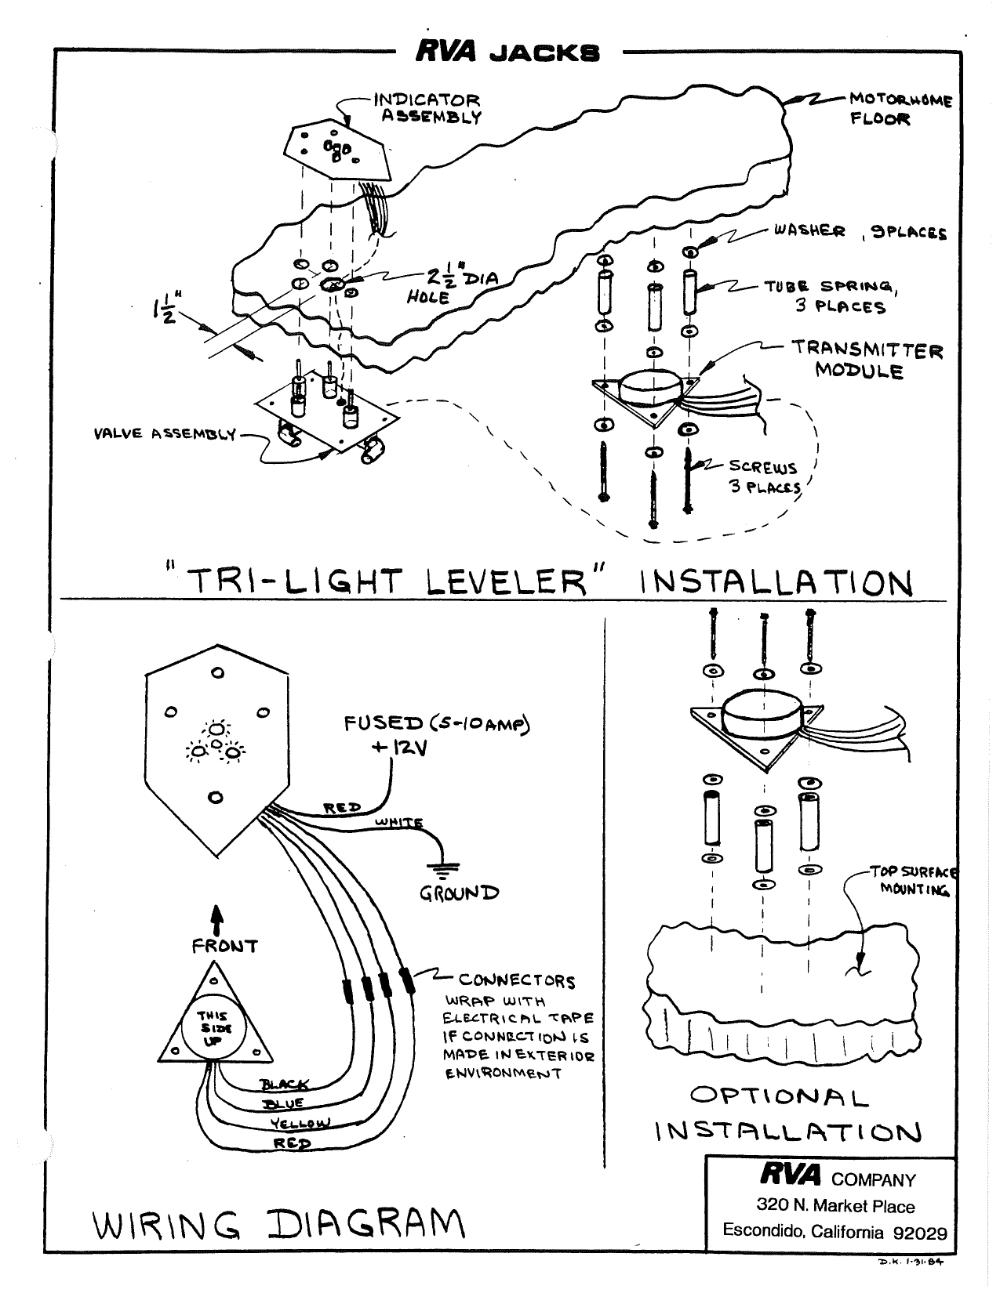 RVA Original Manual Jack System Documentation